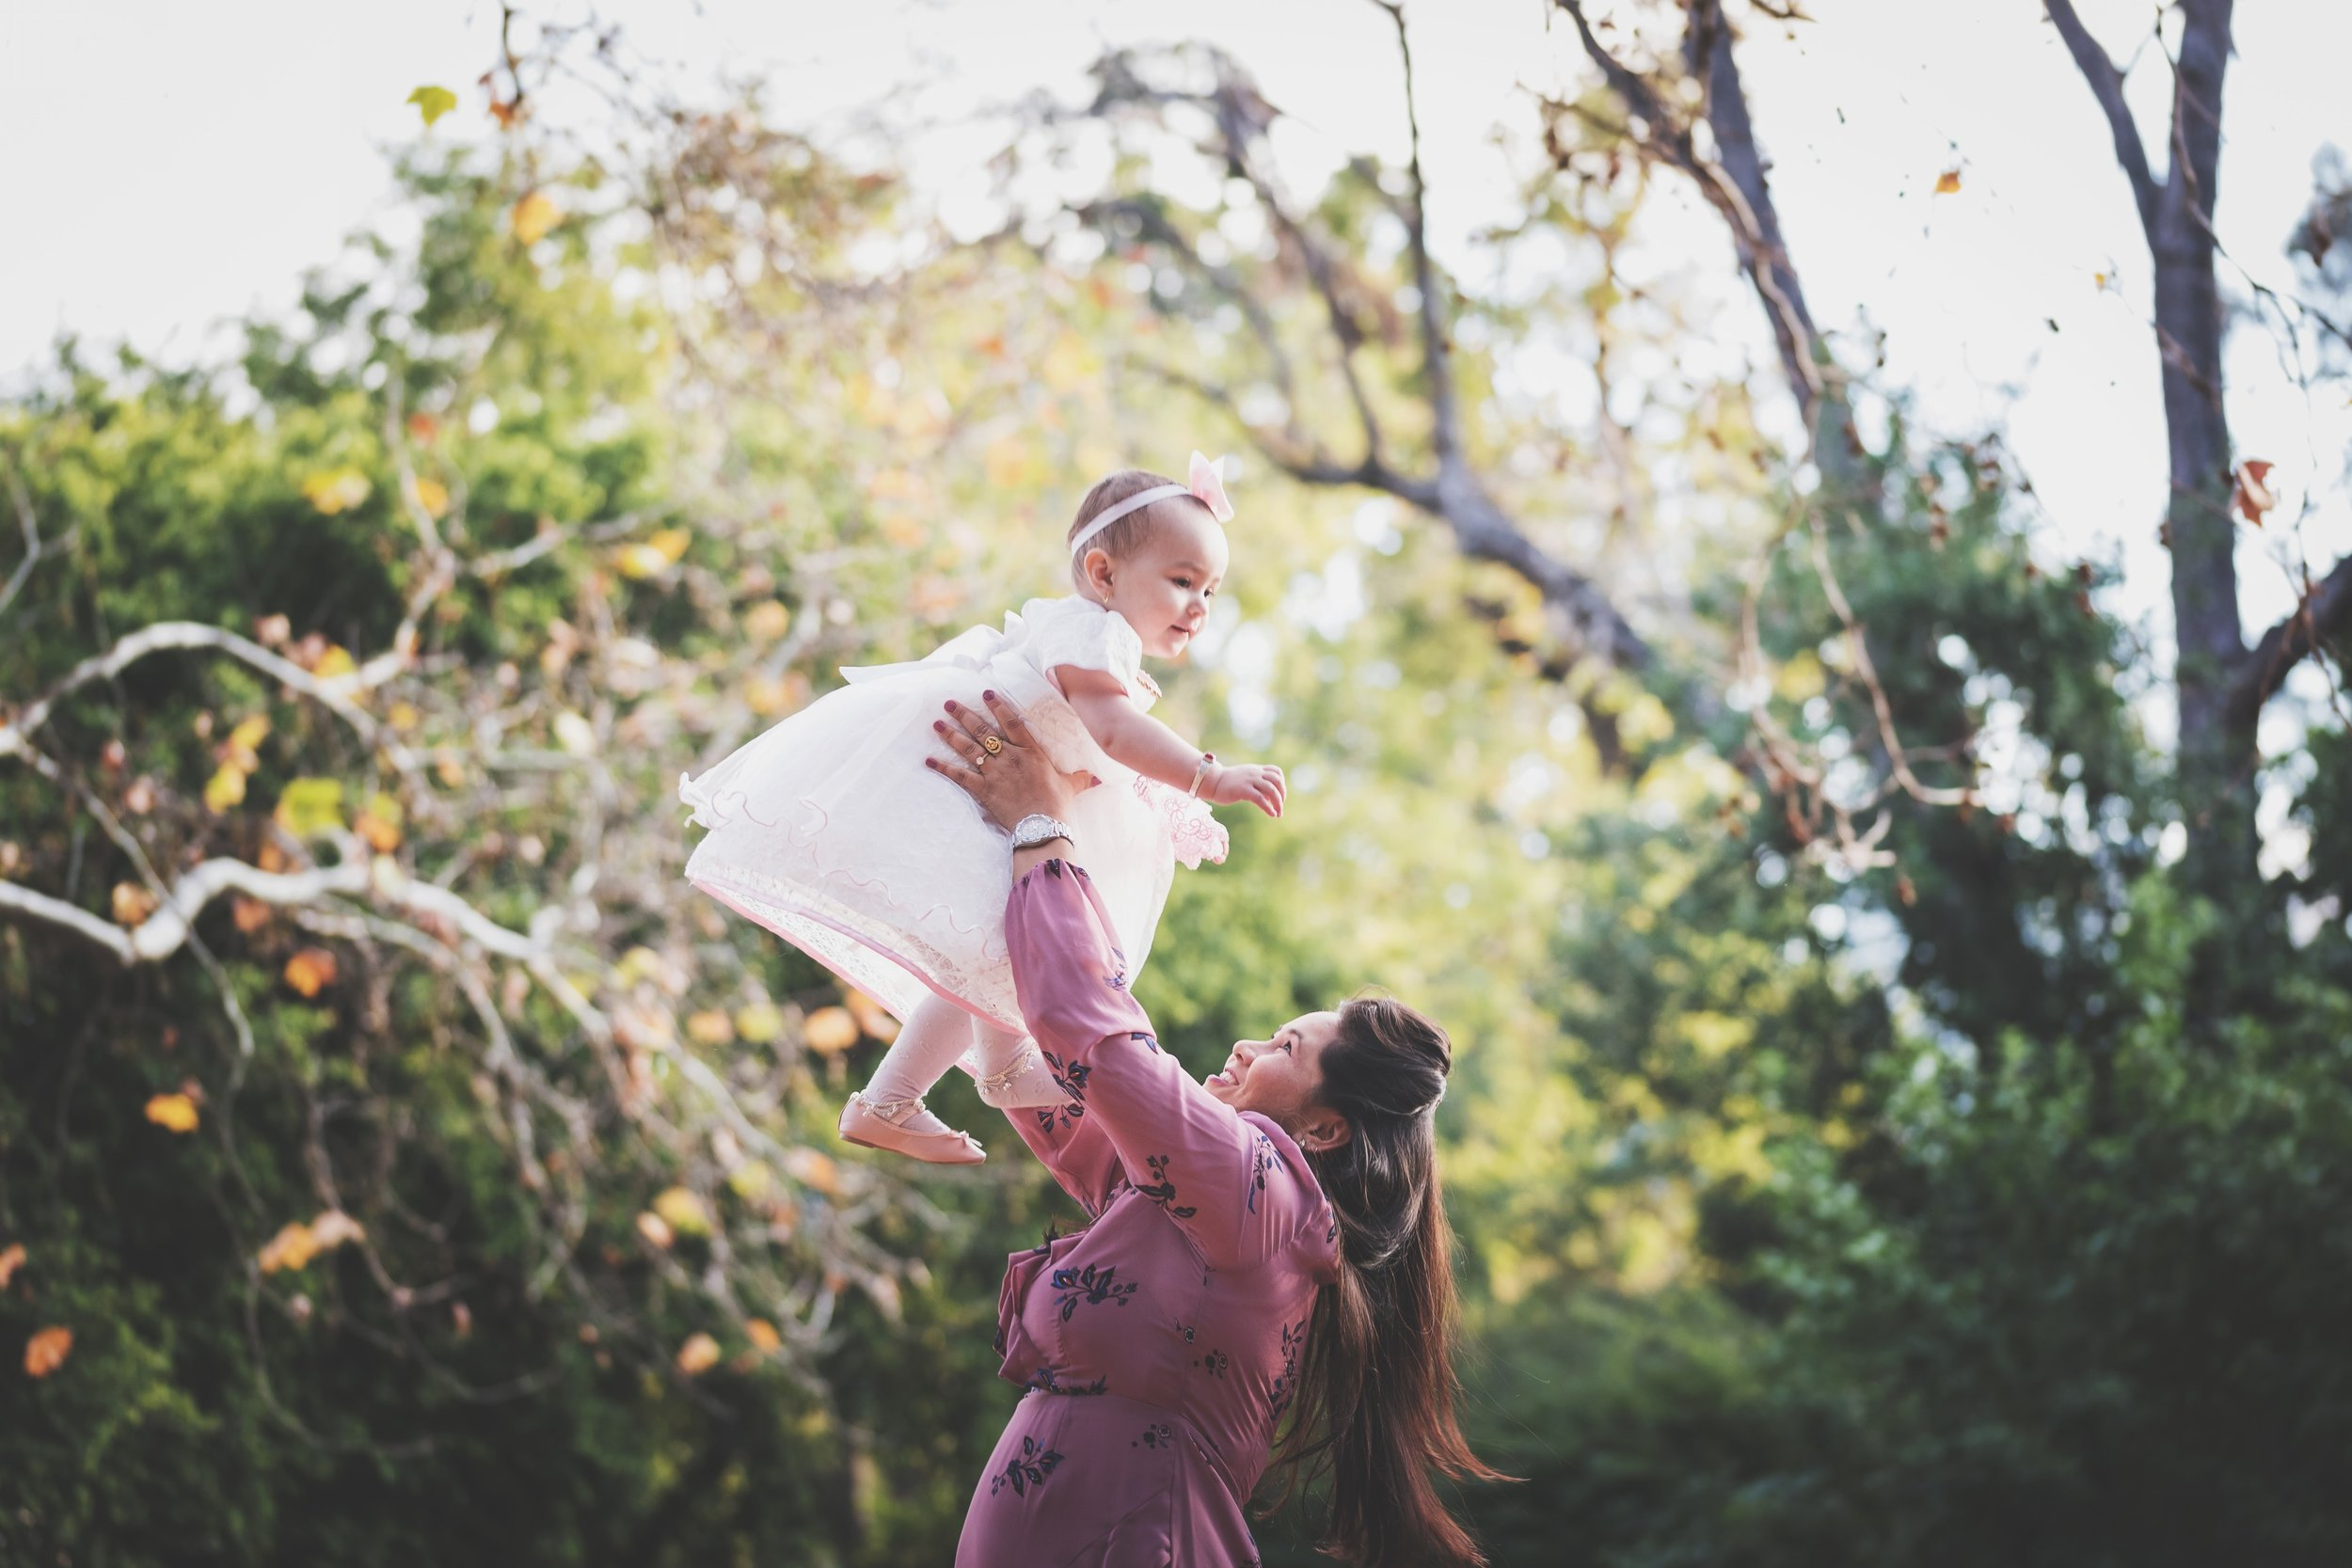 Jessica Lemon Family Baby Photography Adelaide Botanic Gardens 29.jpg